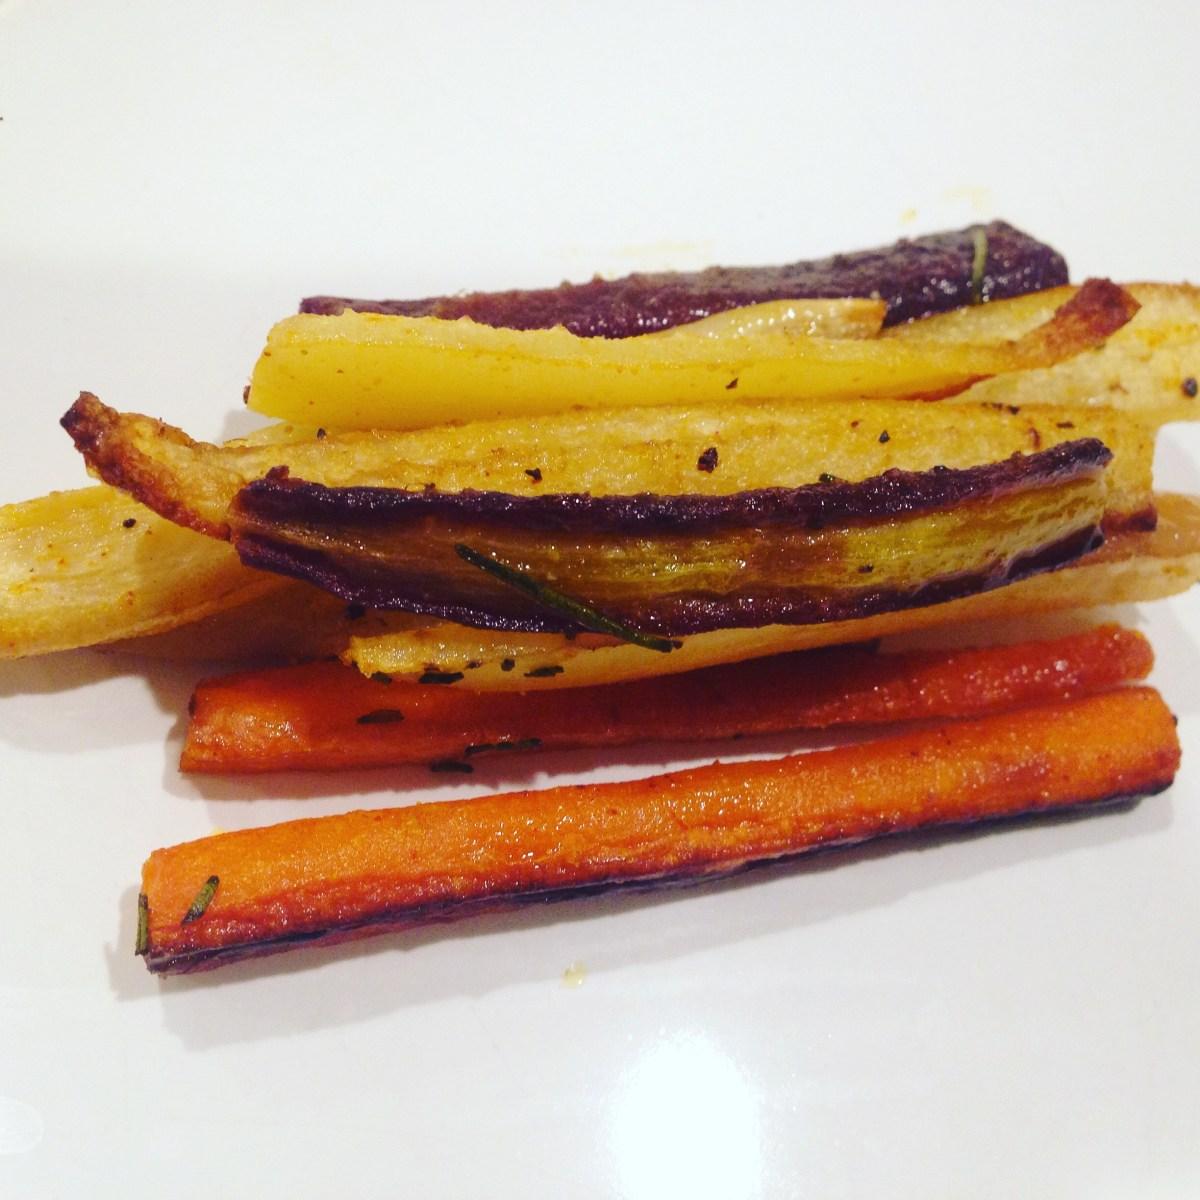 Roasted Maple Rosemary Carrot Fries